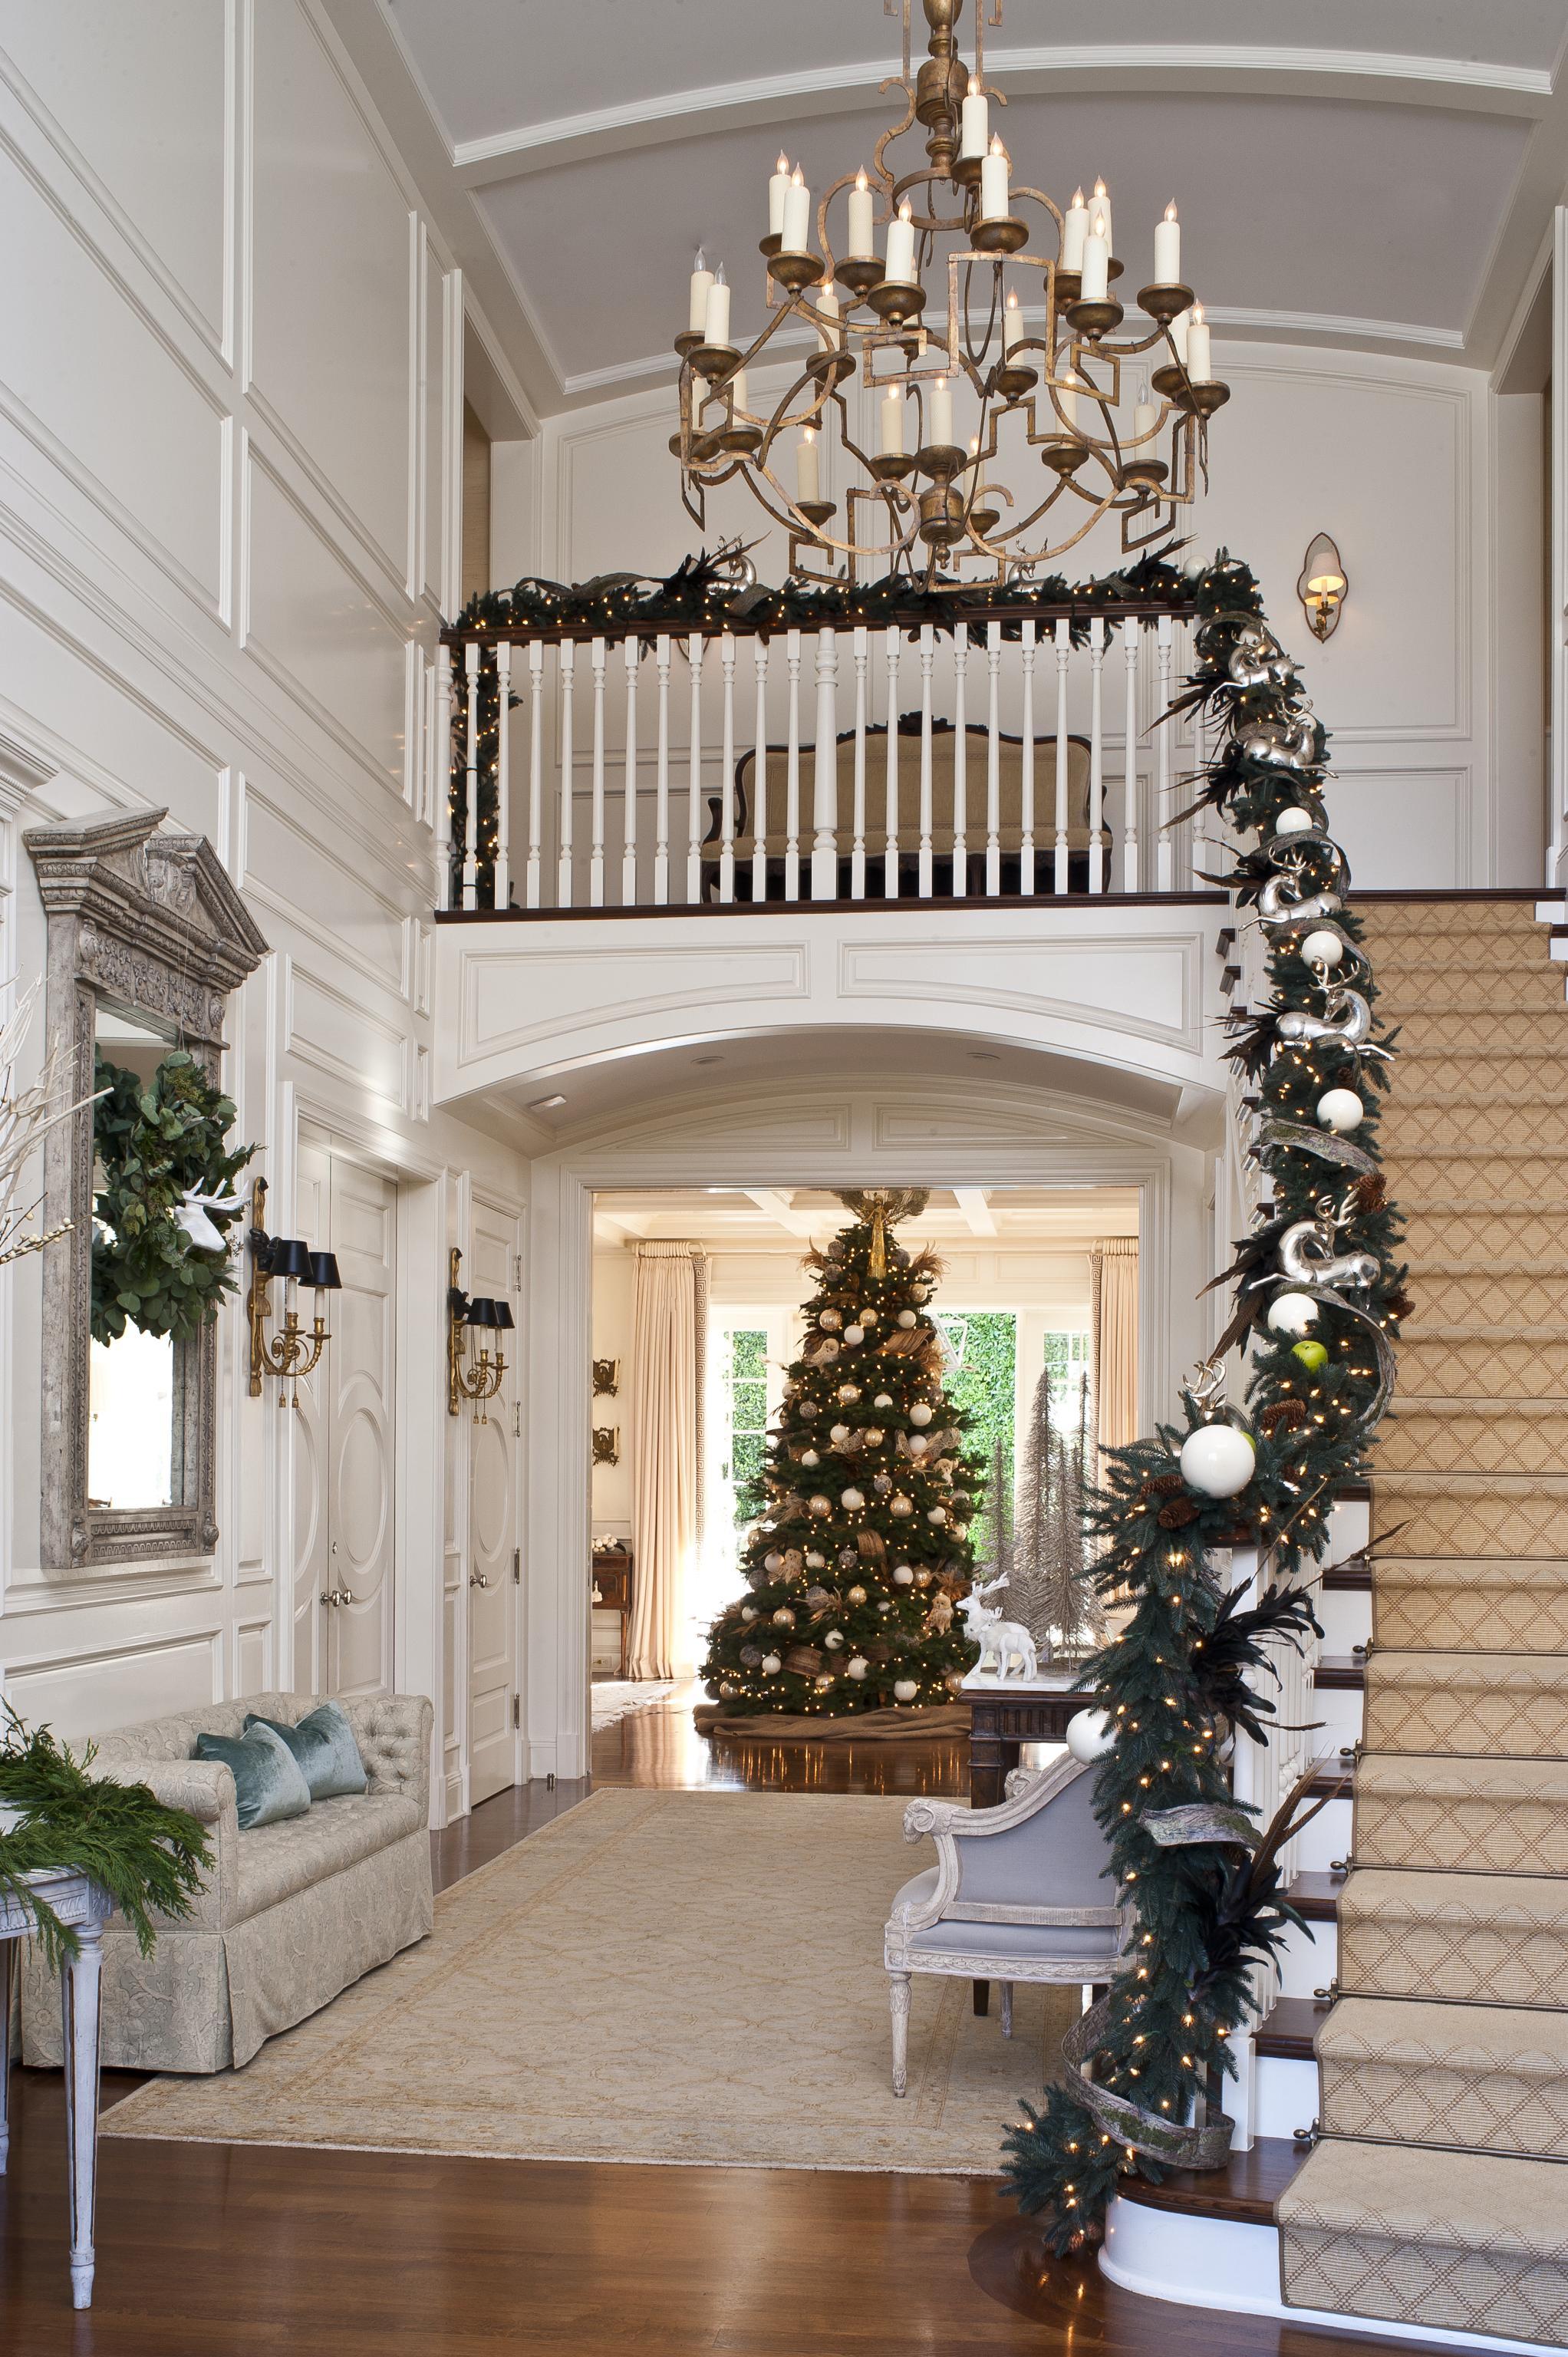 Christmas Stairs Decoration Ideas thewowdecor (27)